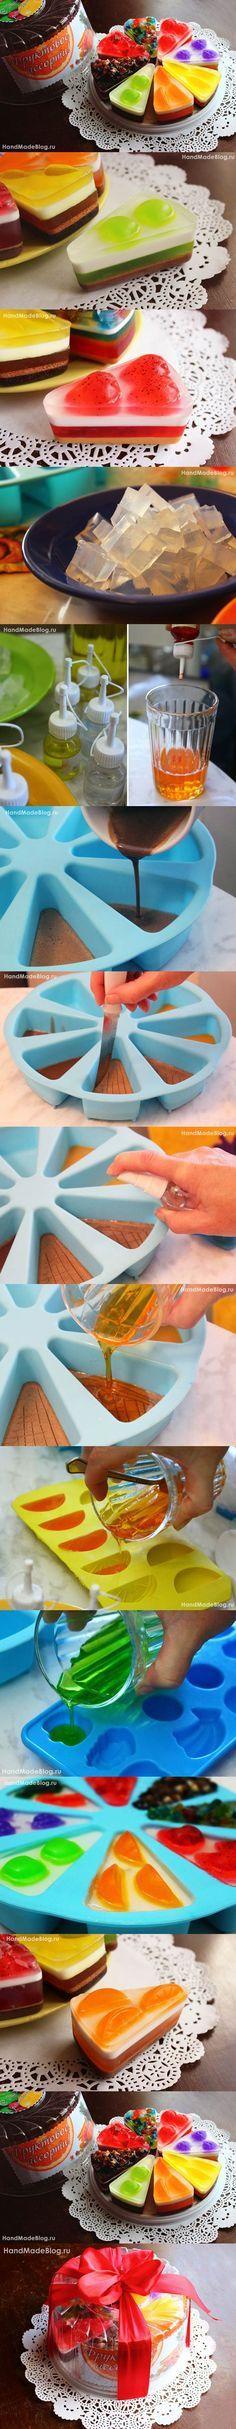 DIY Beautiful Cake of Soap | iCreativeIdeas.com Like Us on Facebook ==> https://www.facebook.com/icreativeideas